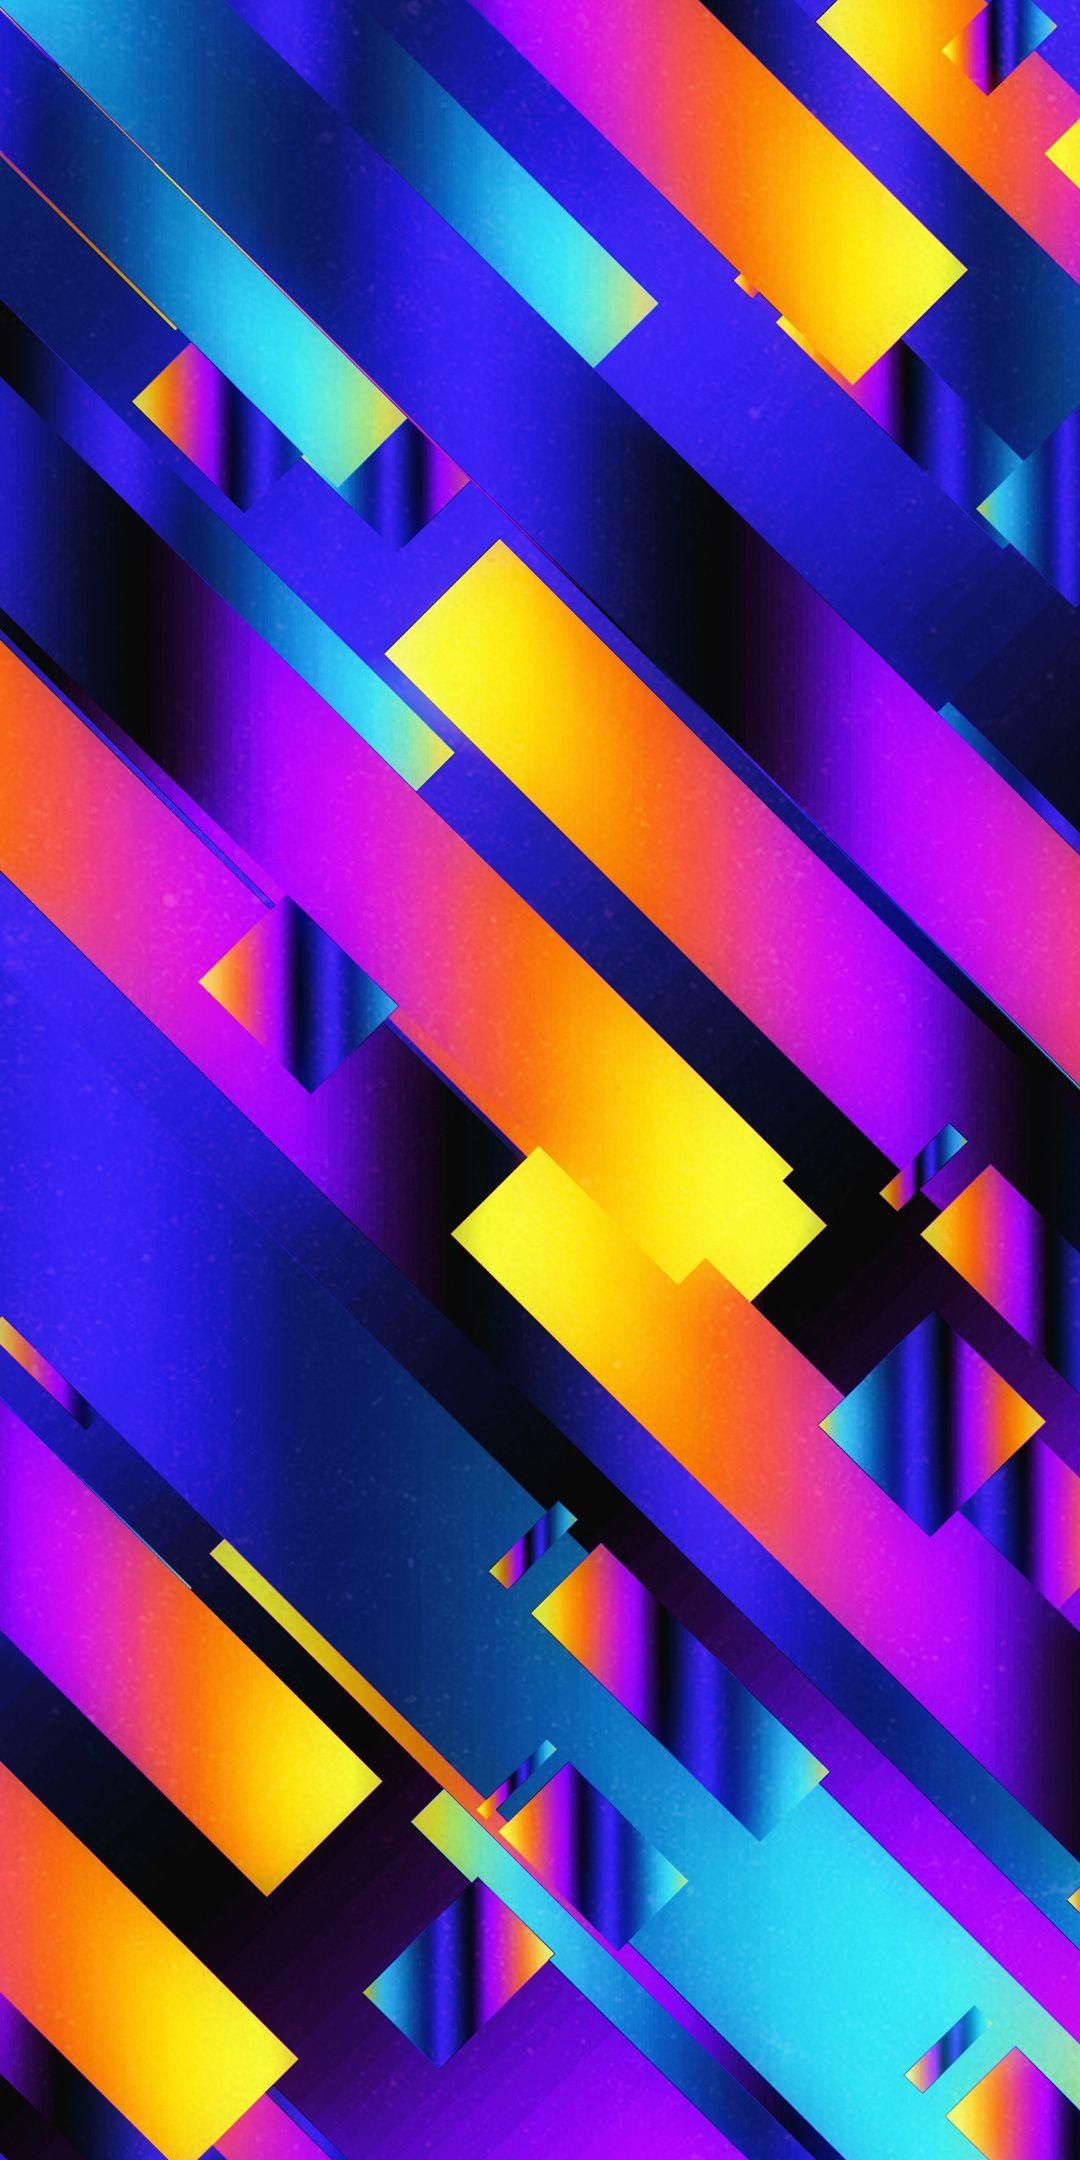 Abstract Neon Pattern Ribbons 1080x2160 Wallpaper Wallpaper